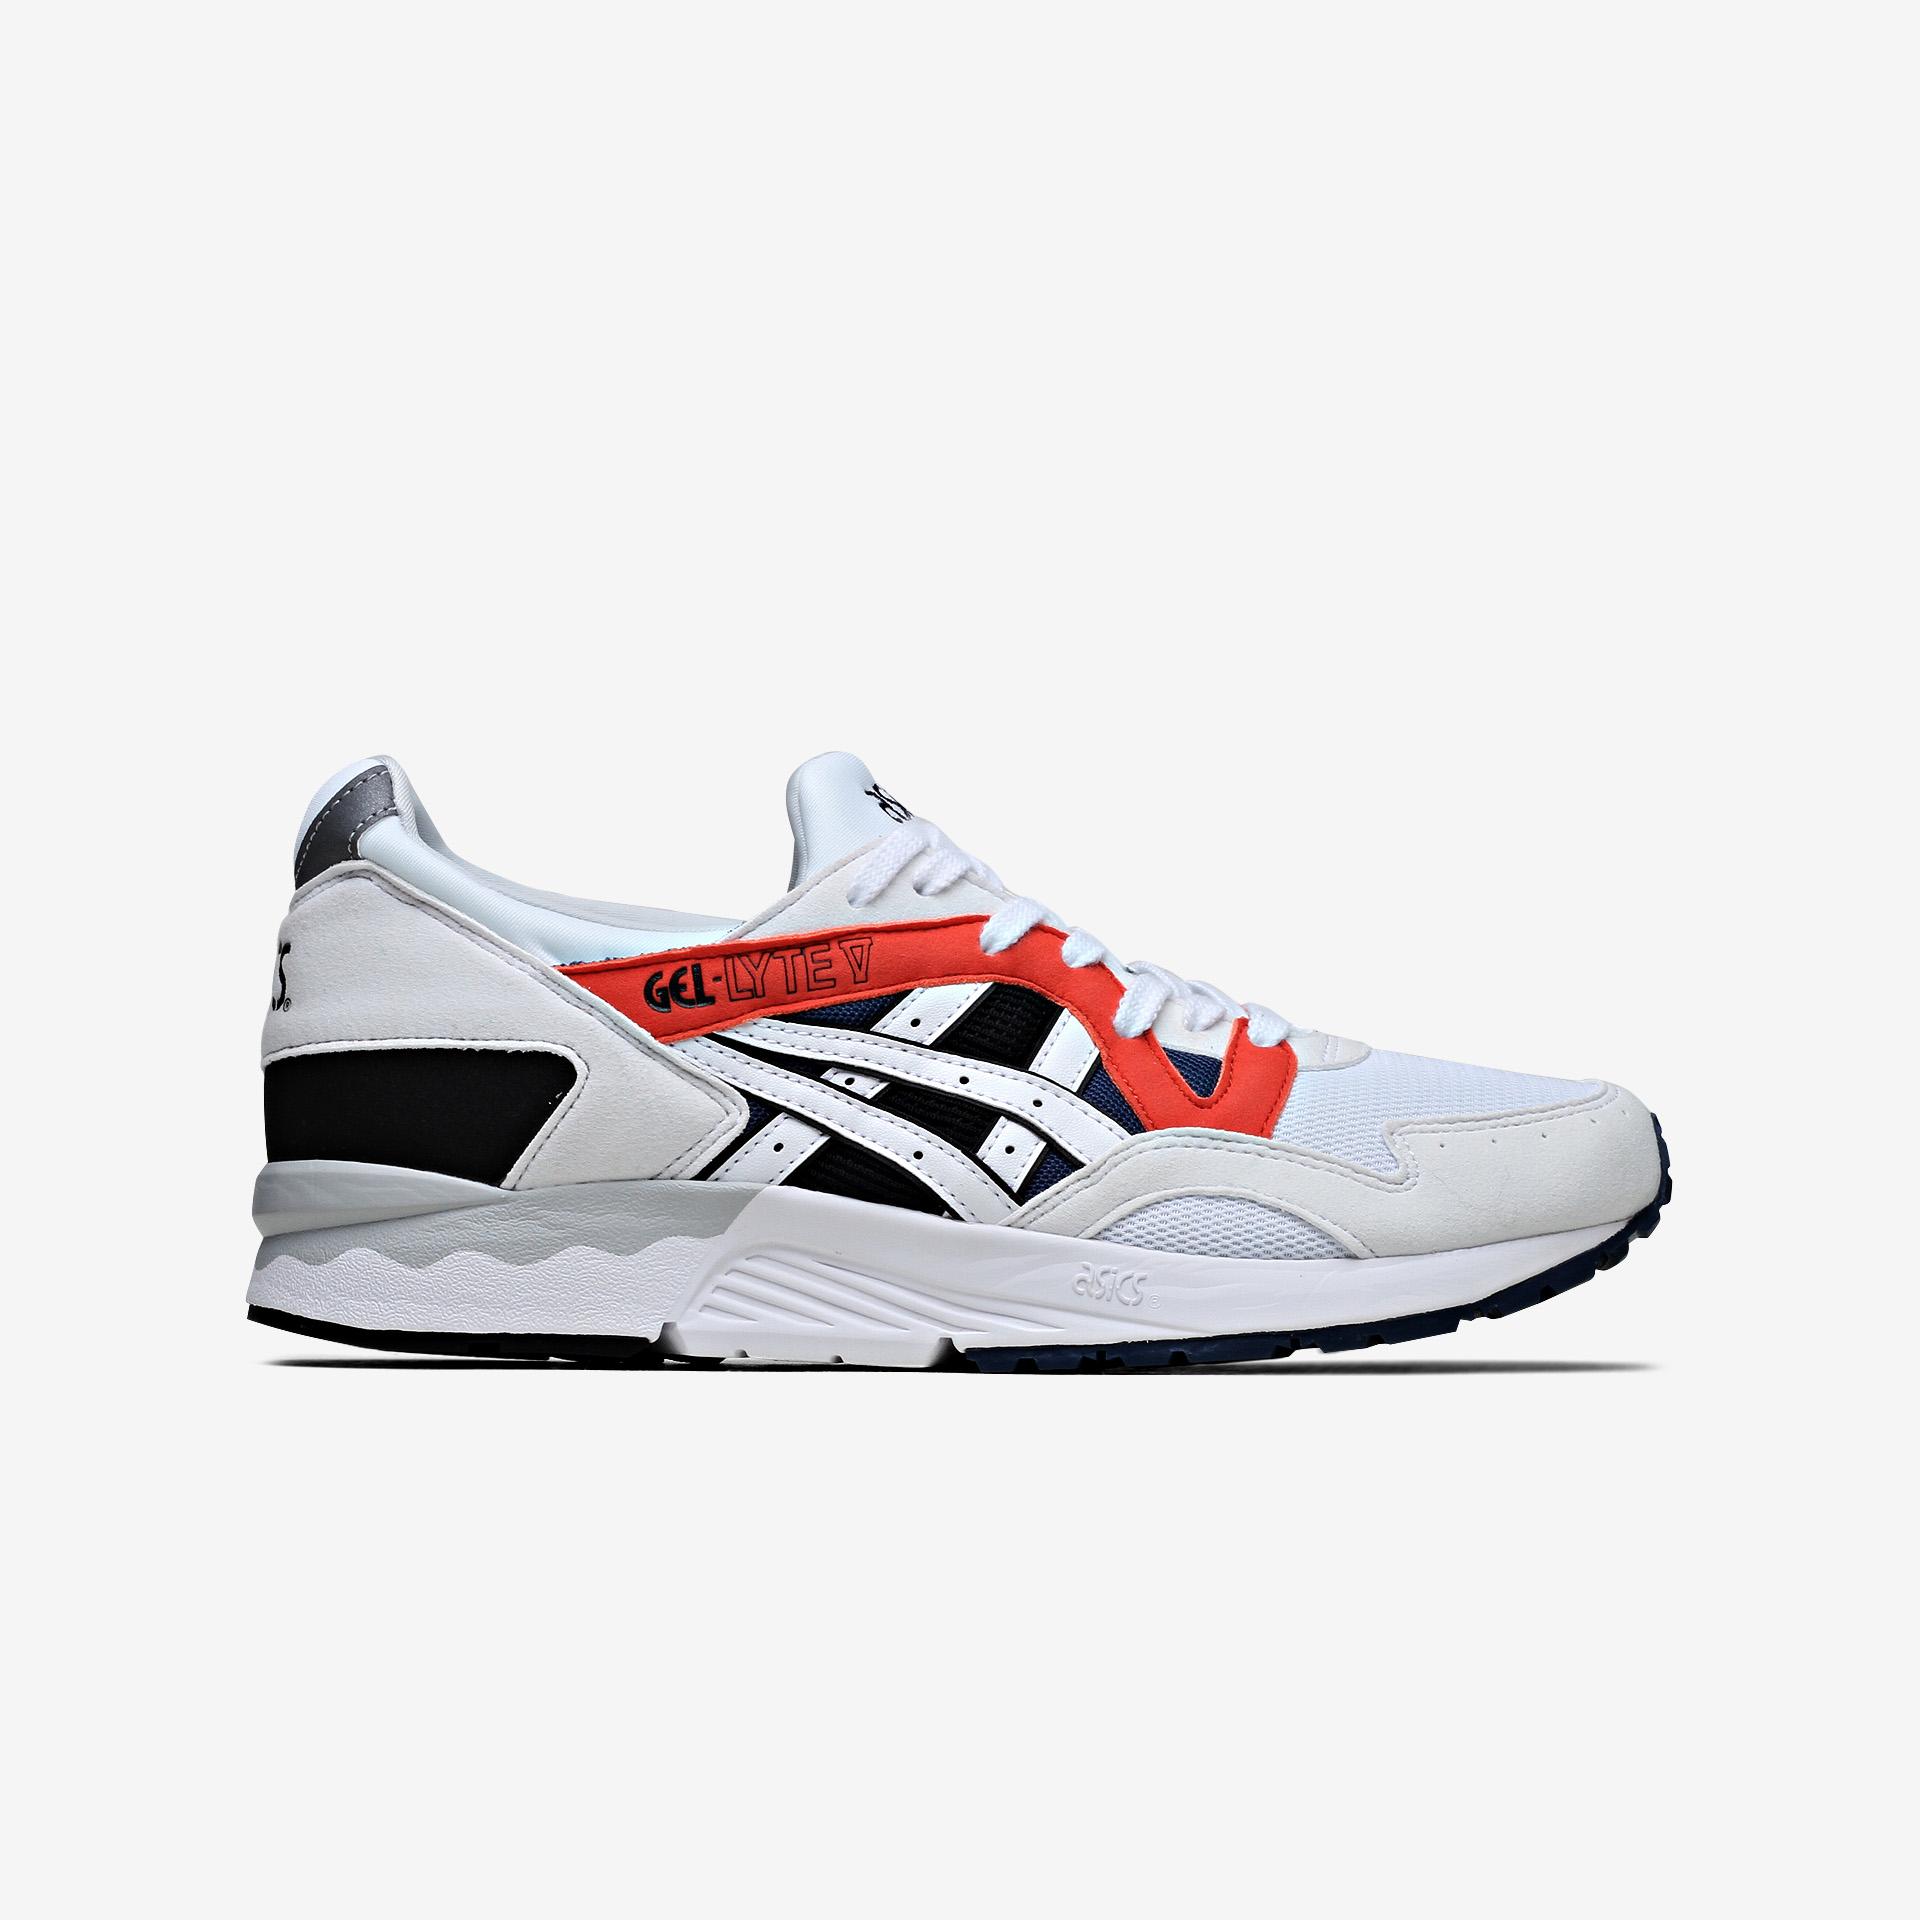 sports shoes 8a15b 1478a GEL-LYTE V OG